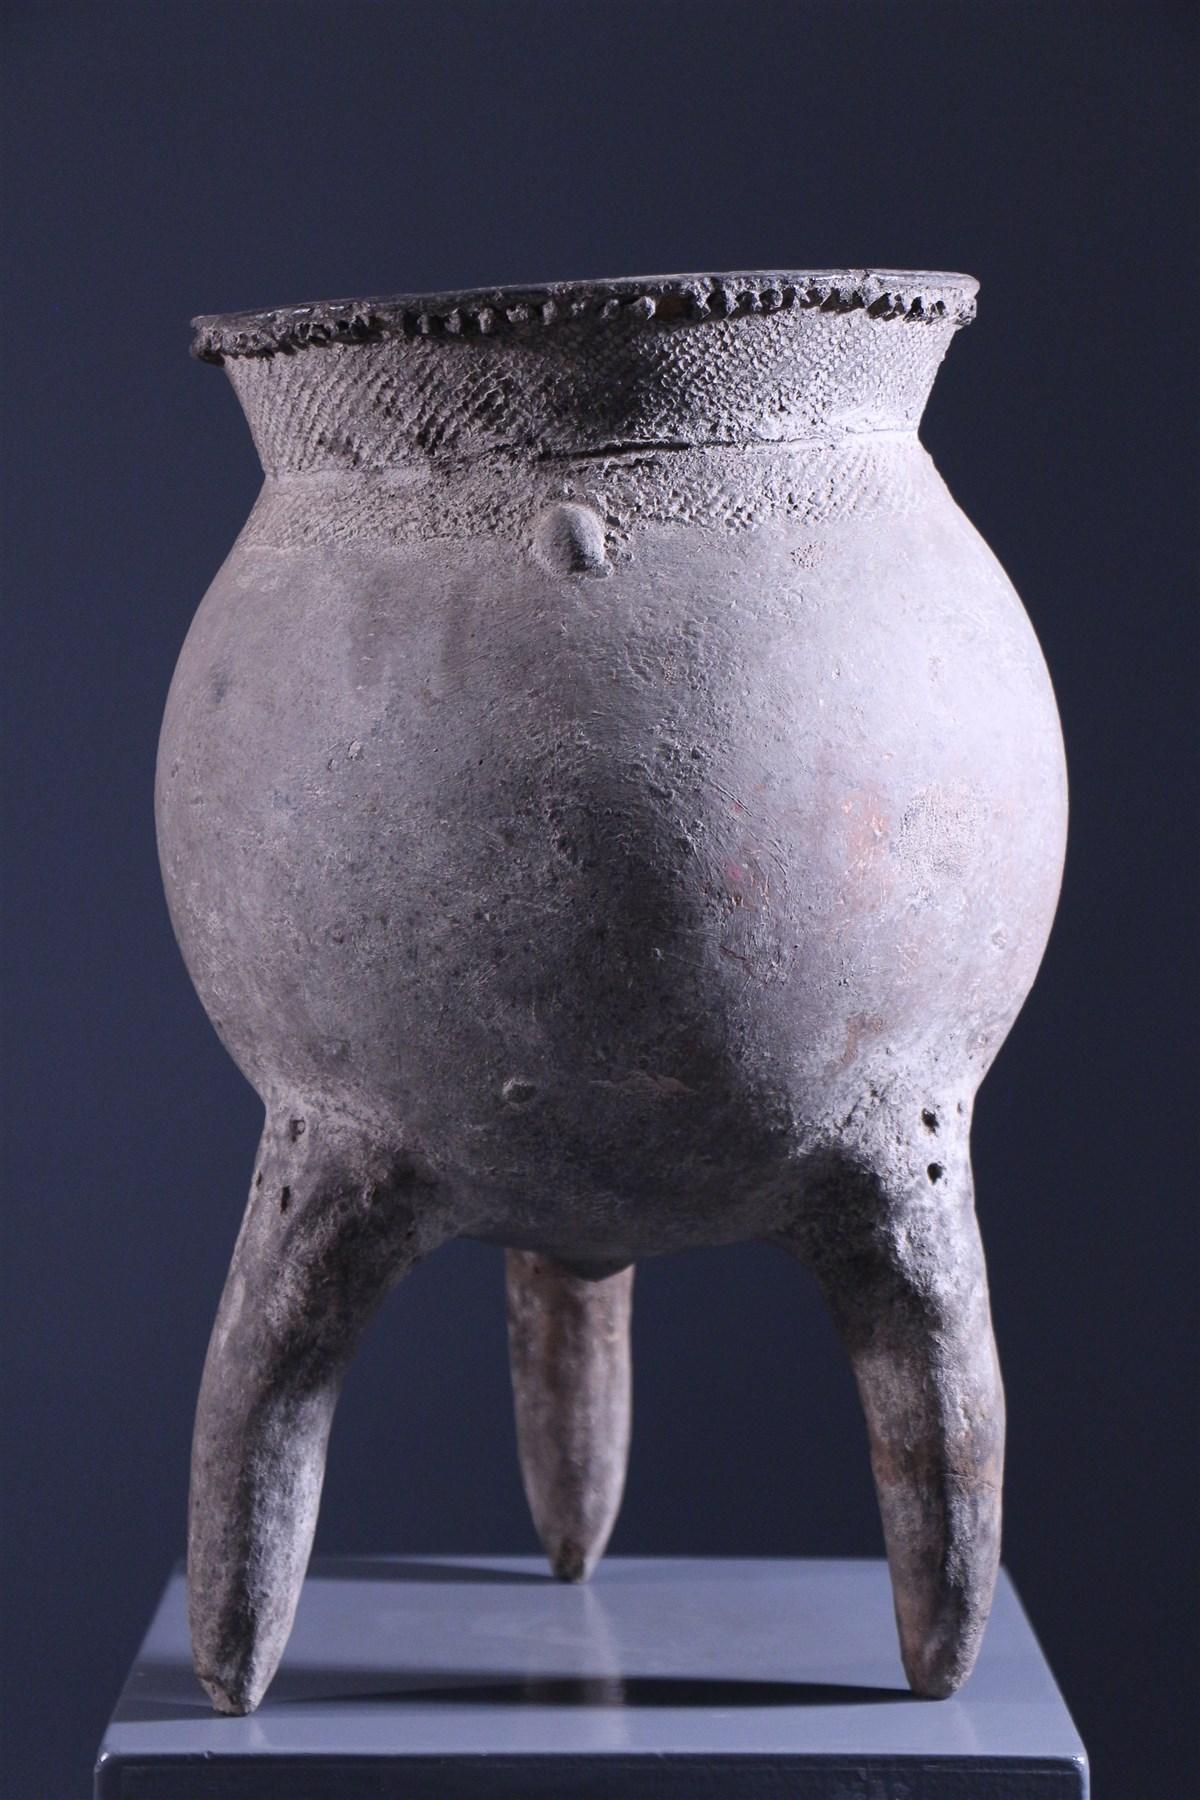 Matakam Jar - Tribal art